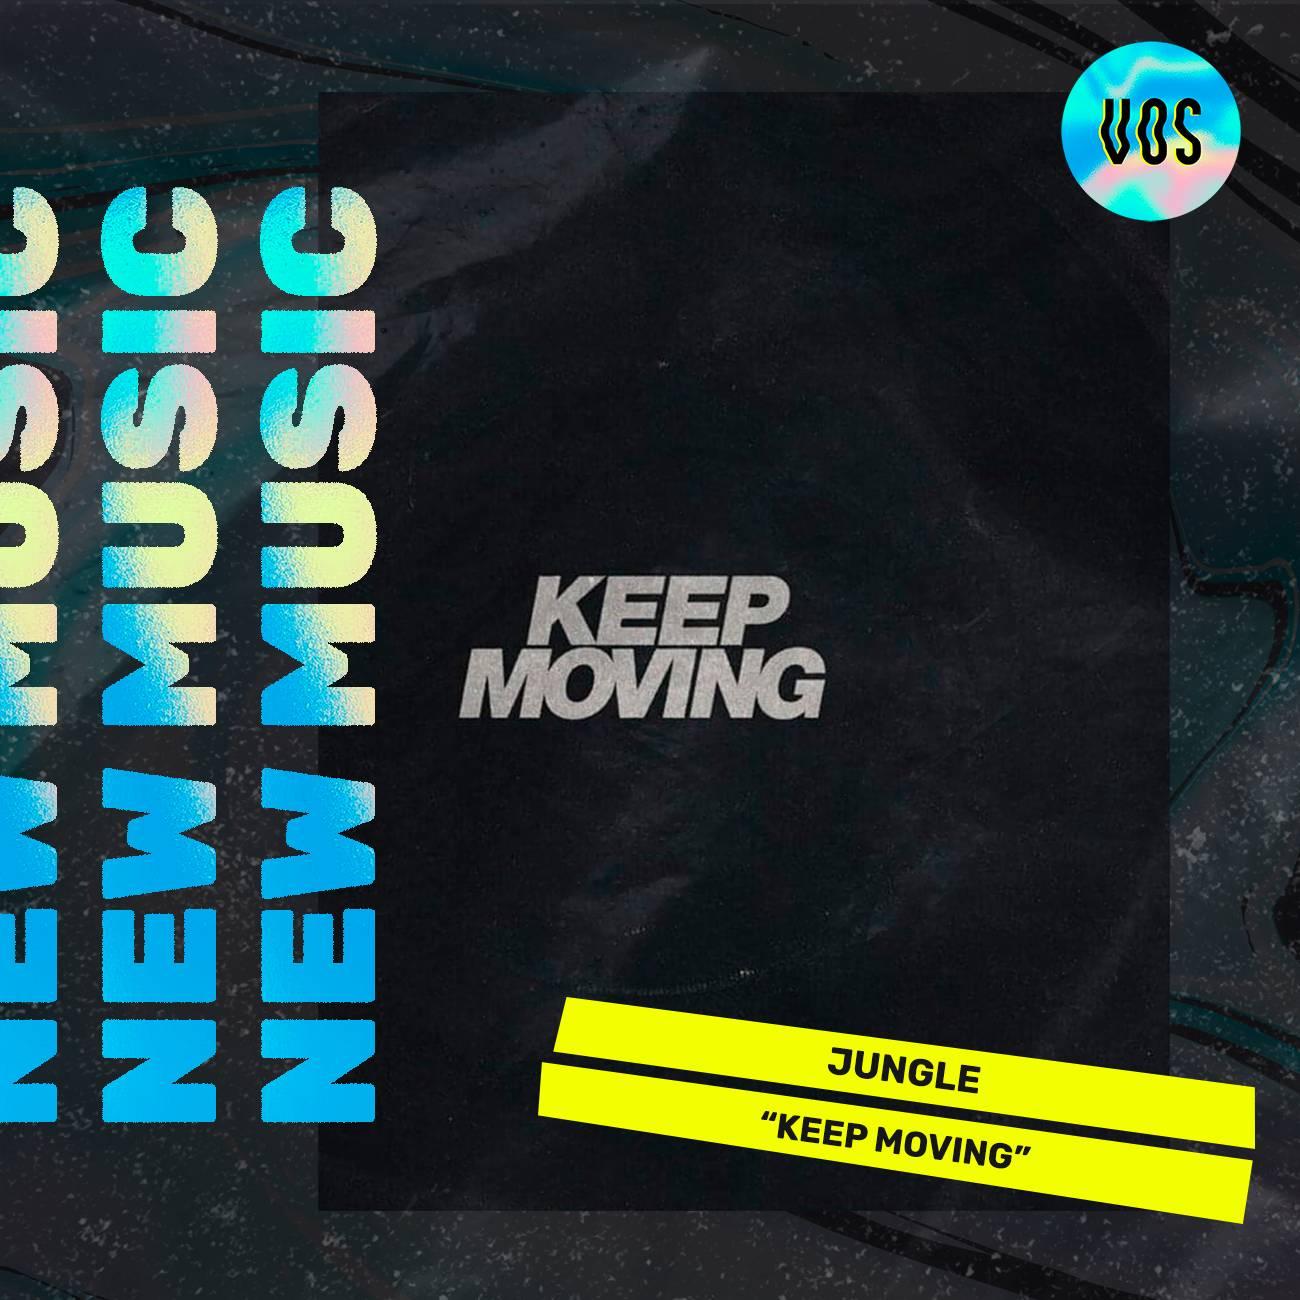 JUNGLE_KEEPMOVING_TRACKS_VIBESOFSILENCE